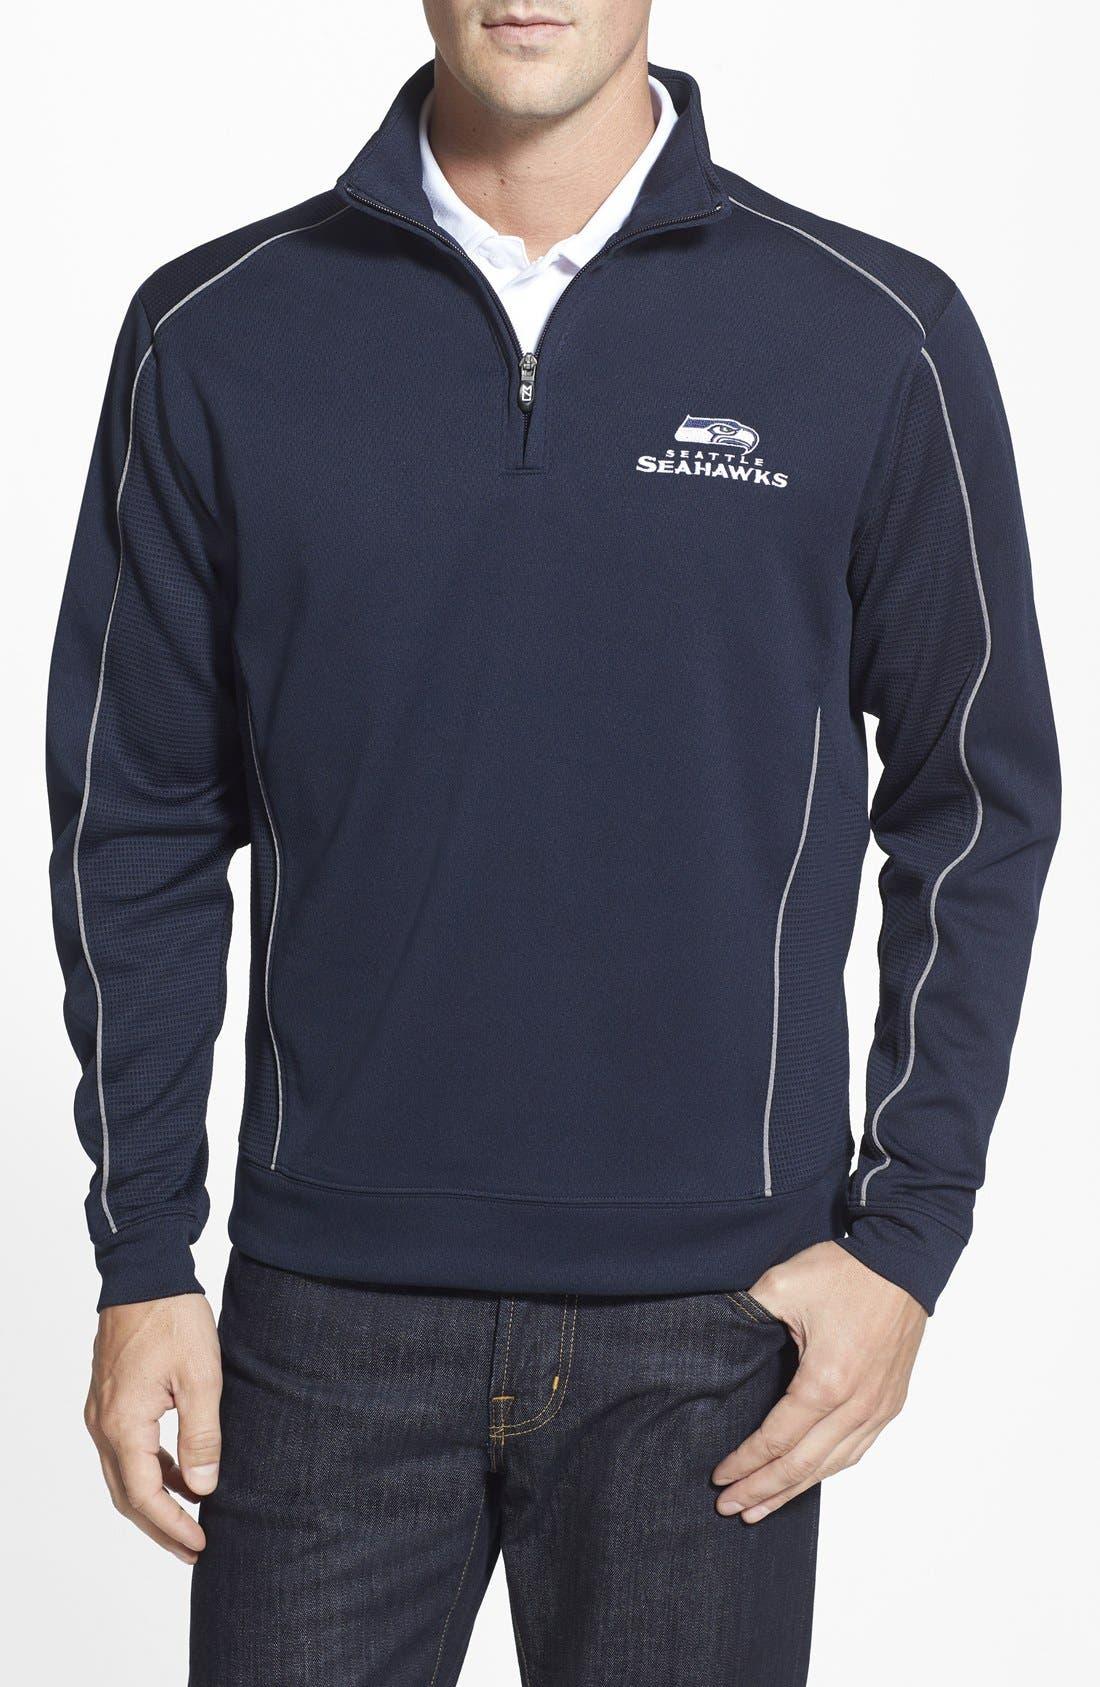 Seattle Seahawks - Edge DryTec Moisture Wicking Half Zip Pullover,                         Main,                         color,